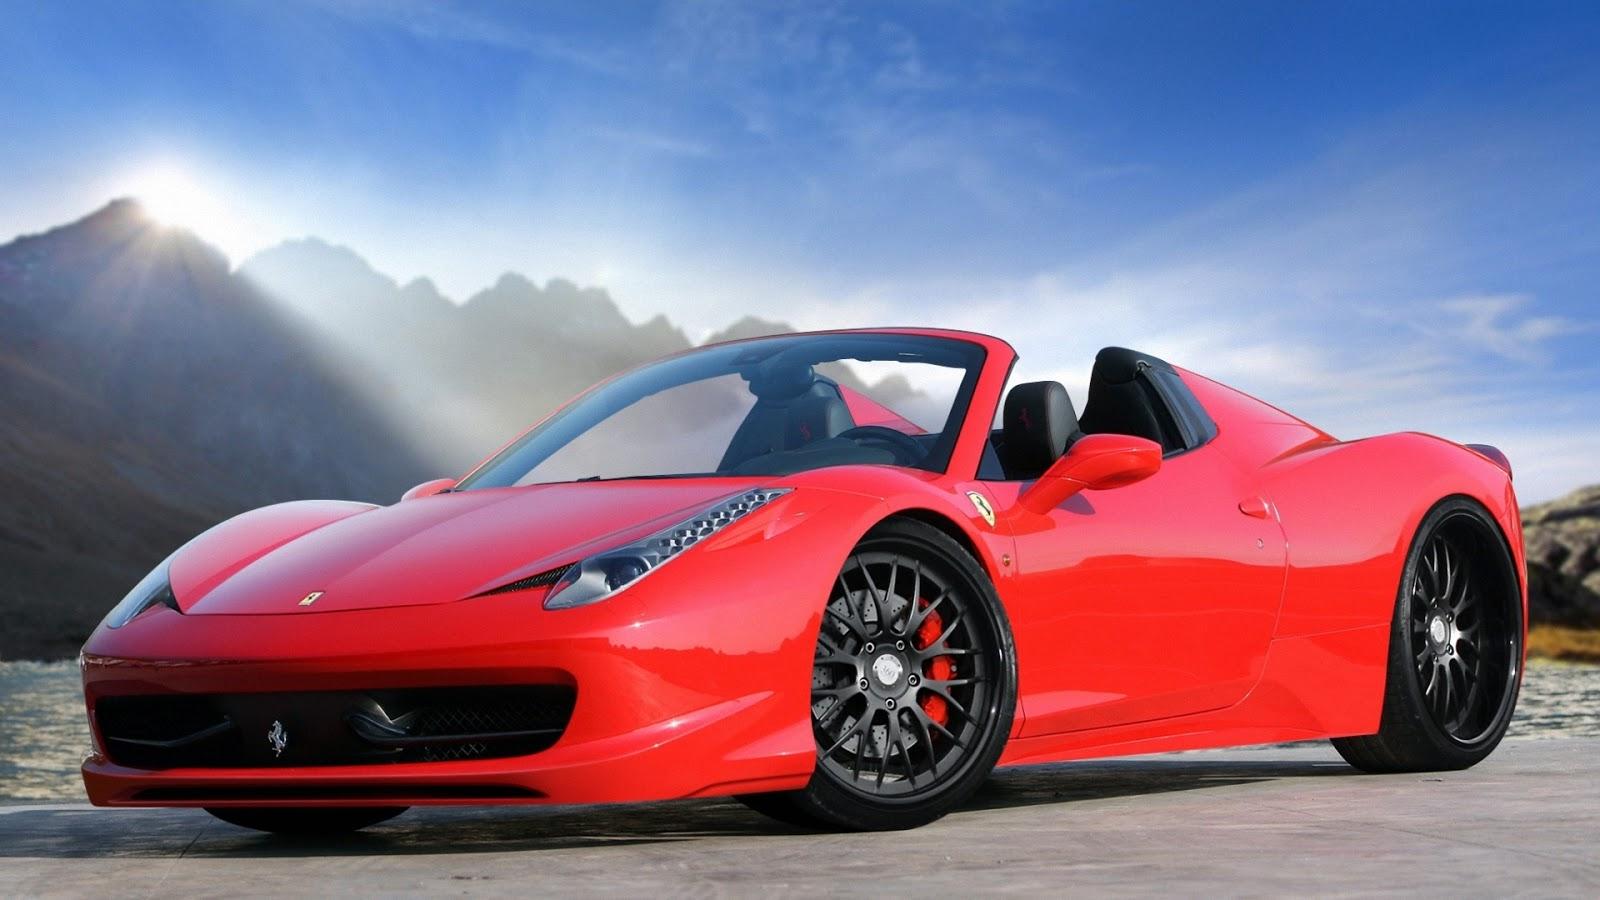 Ferrari wallpapers hd free download hd wallpaper - Ferrari hd wallpapers free download ...